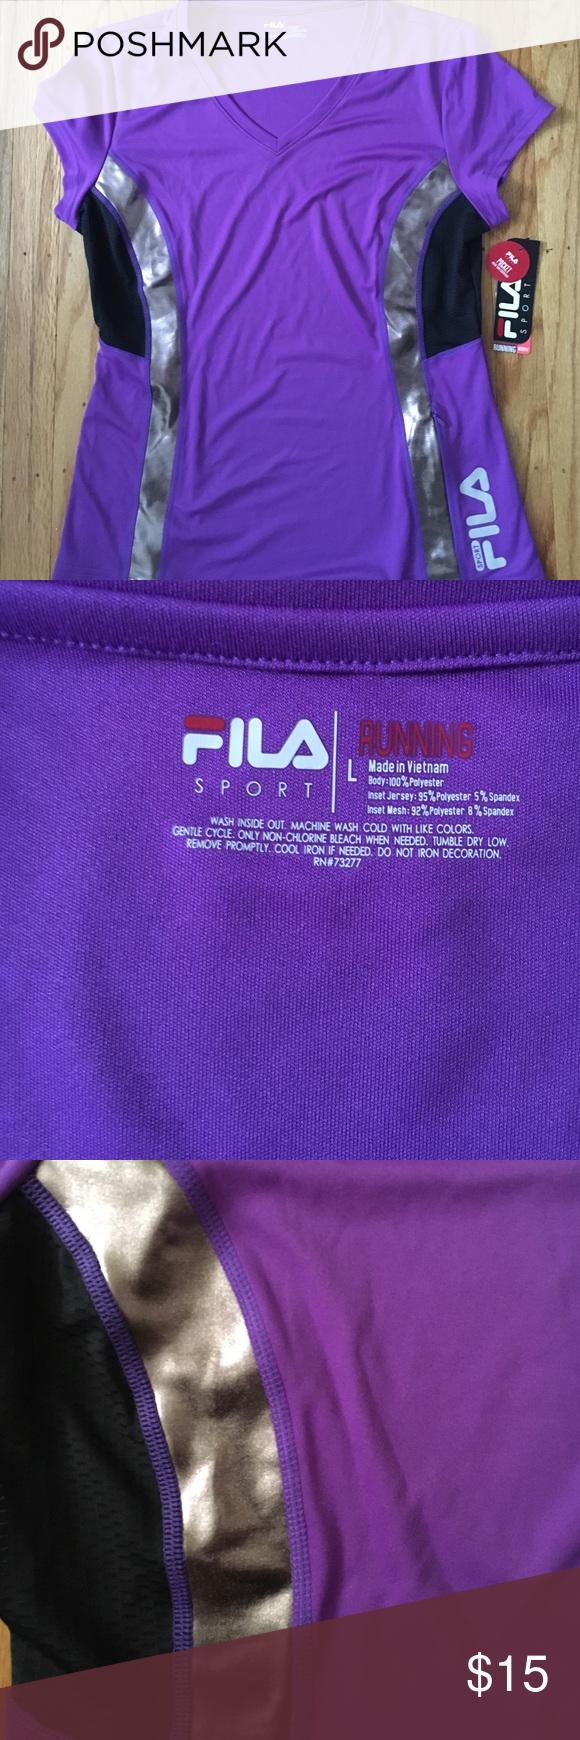 Short sleeve filas running shirt. Size large Purple, silver, and black filas runners short sleeve shirt filas Tops Tees - Short Sleeve